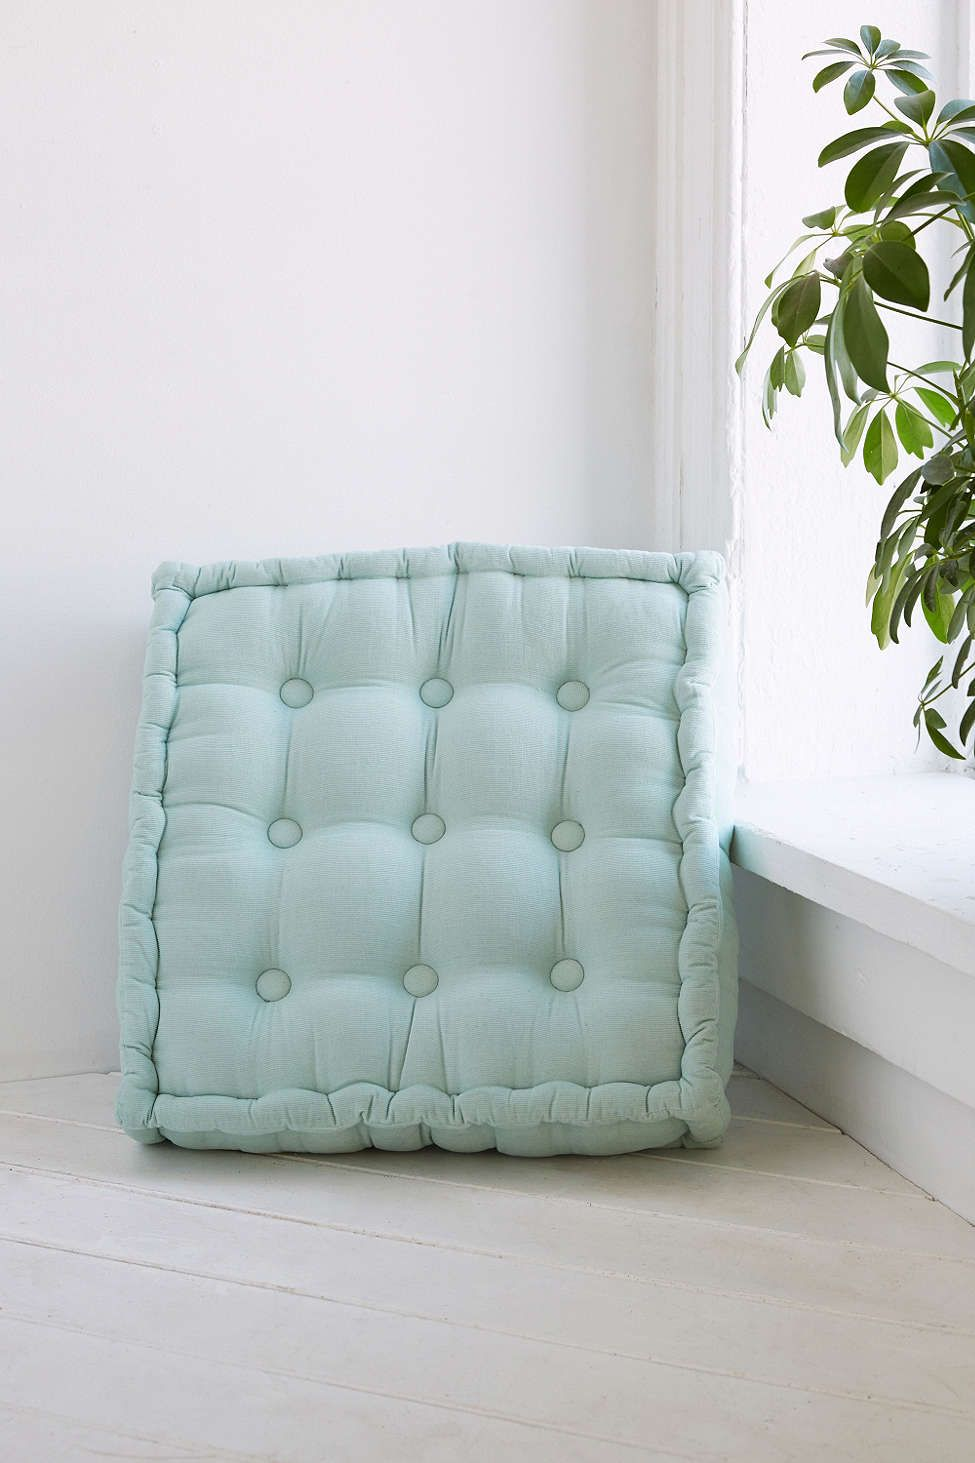 Tufted Corduroy Floor Pillow Floor pillows, Green home